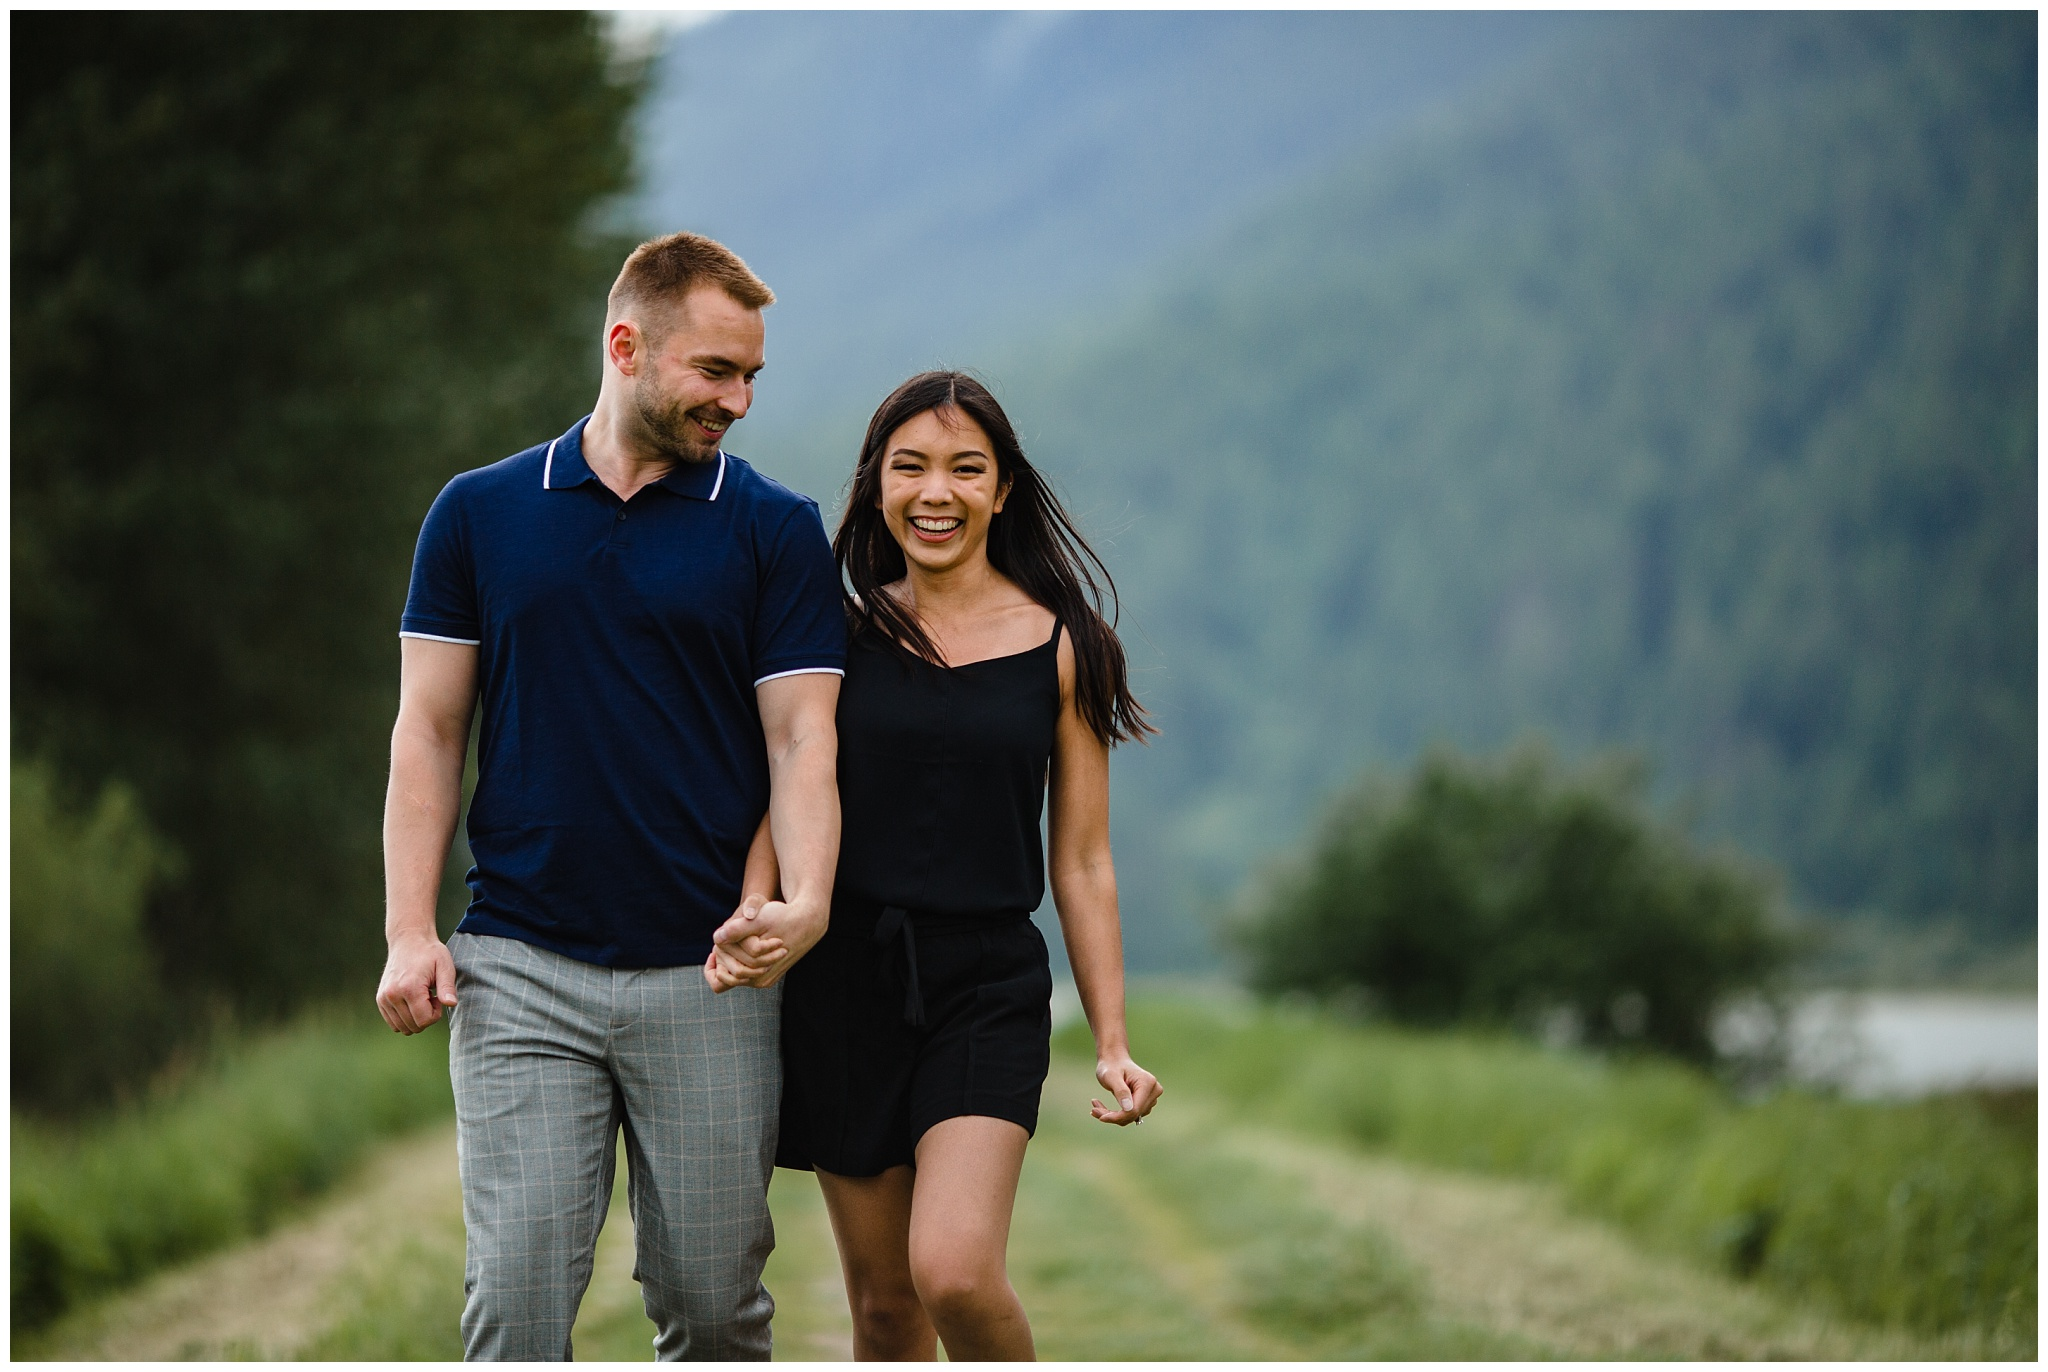 Pitt Lake Engagement Photos Maple Ridge Candid Fun Romantic Couples Photography_0006.jpg